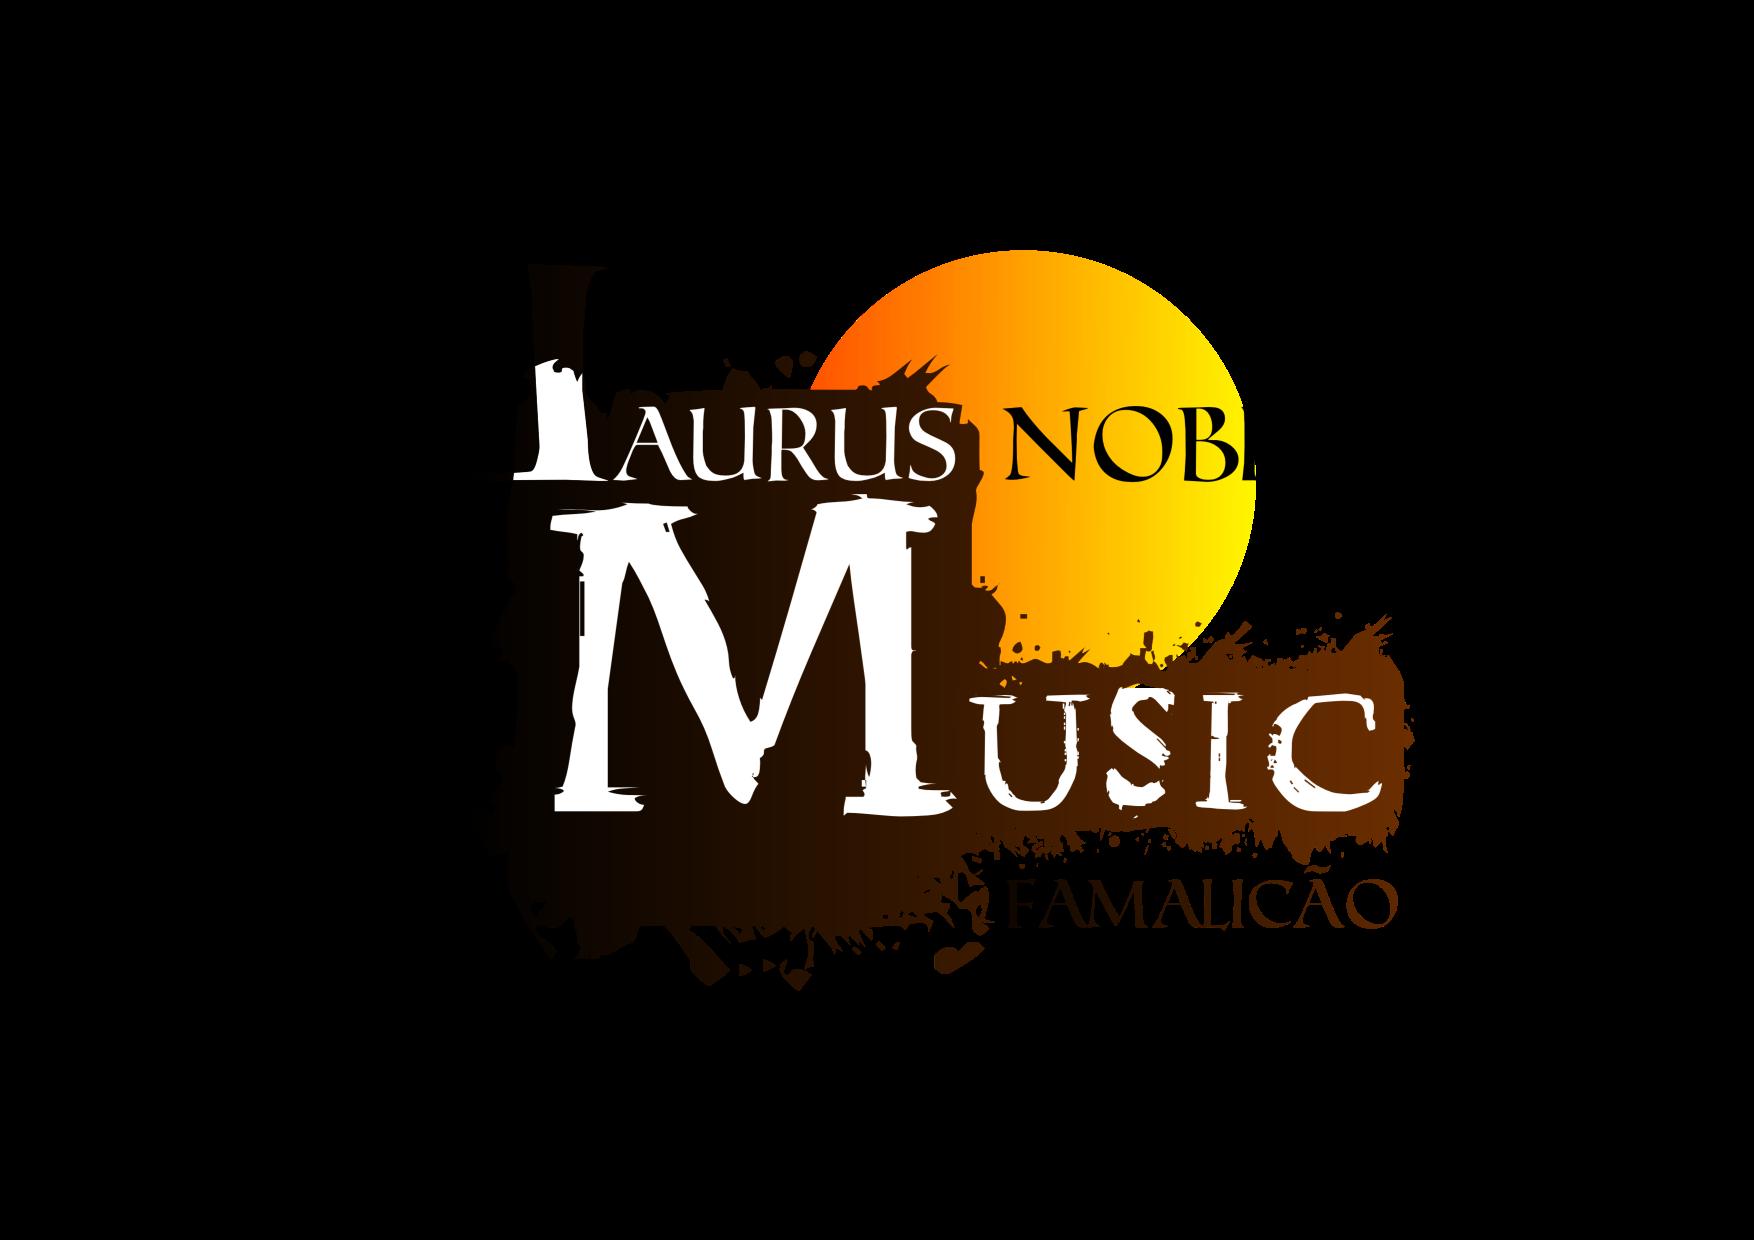 LAURUS NOBILIS MUSIC FAMALICÃO Louro, Vila Nova de Famalicão